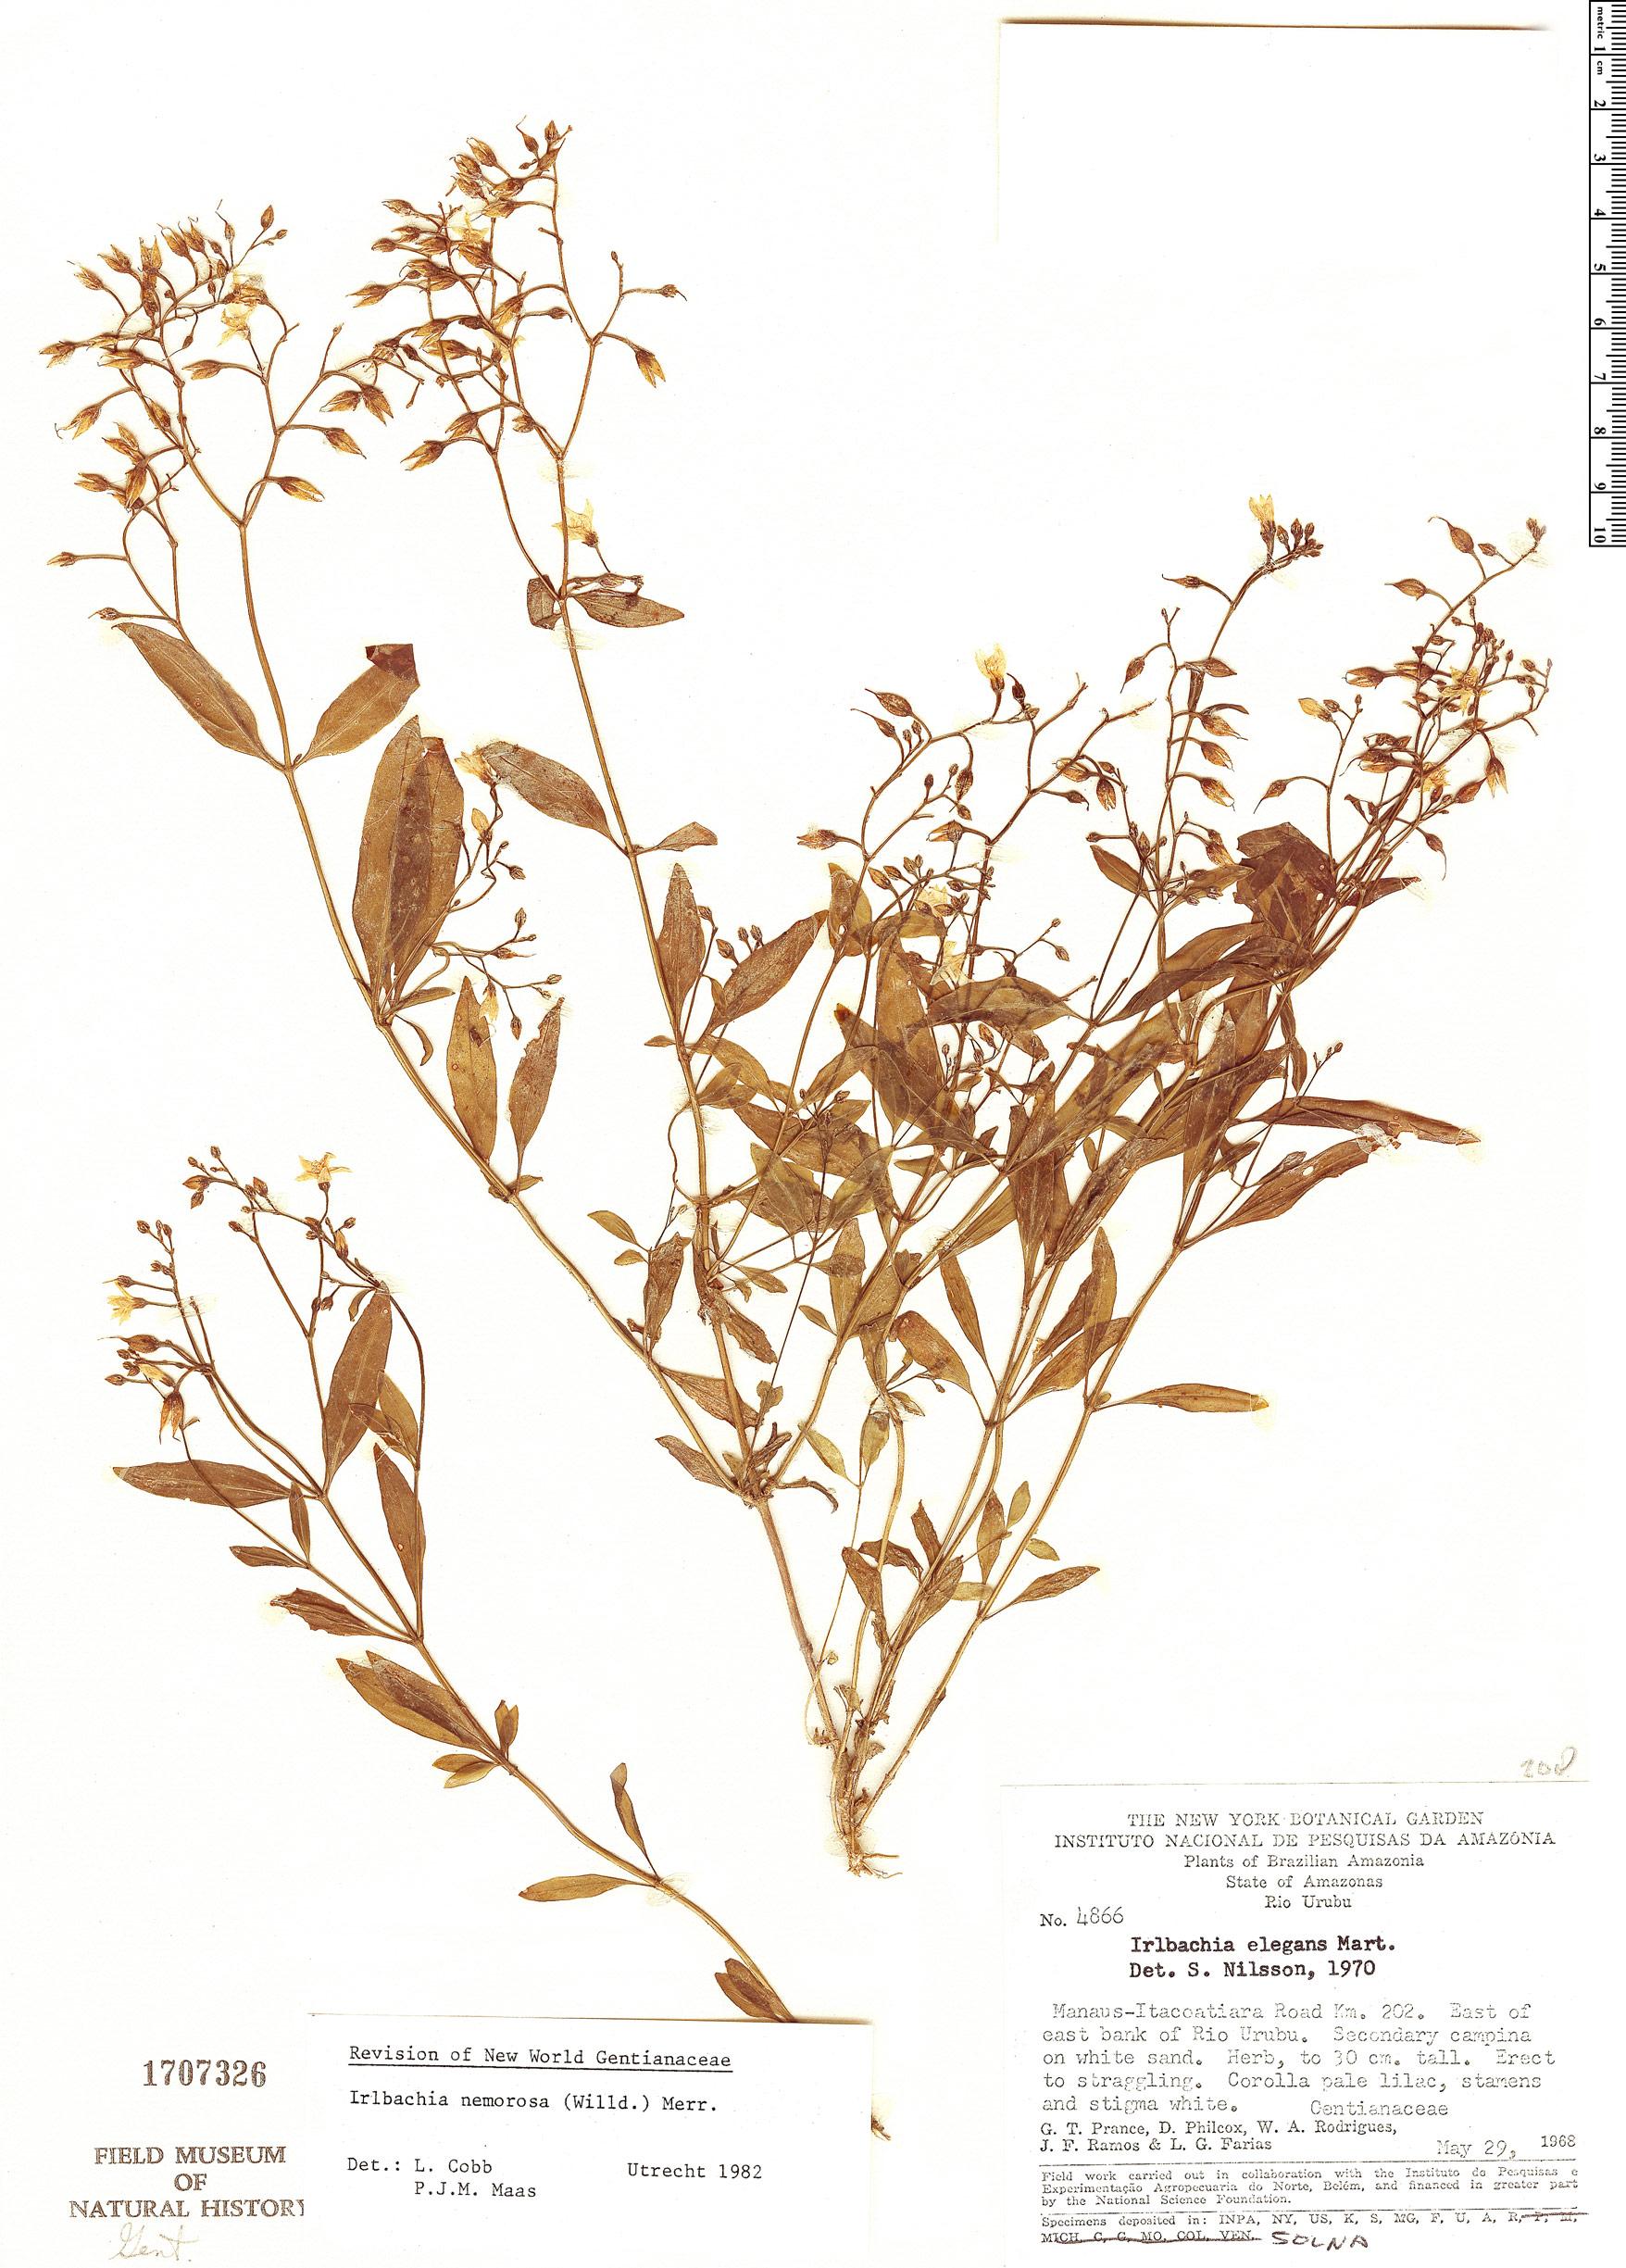 Specimen: Irlbachia nemorosa